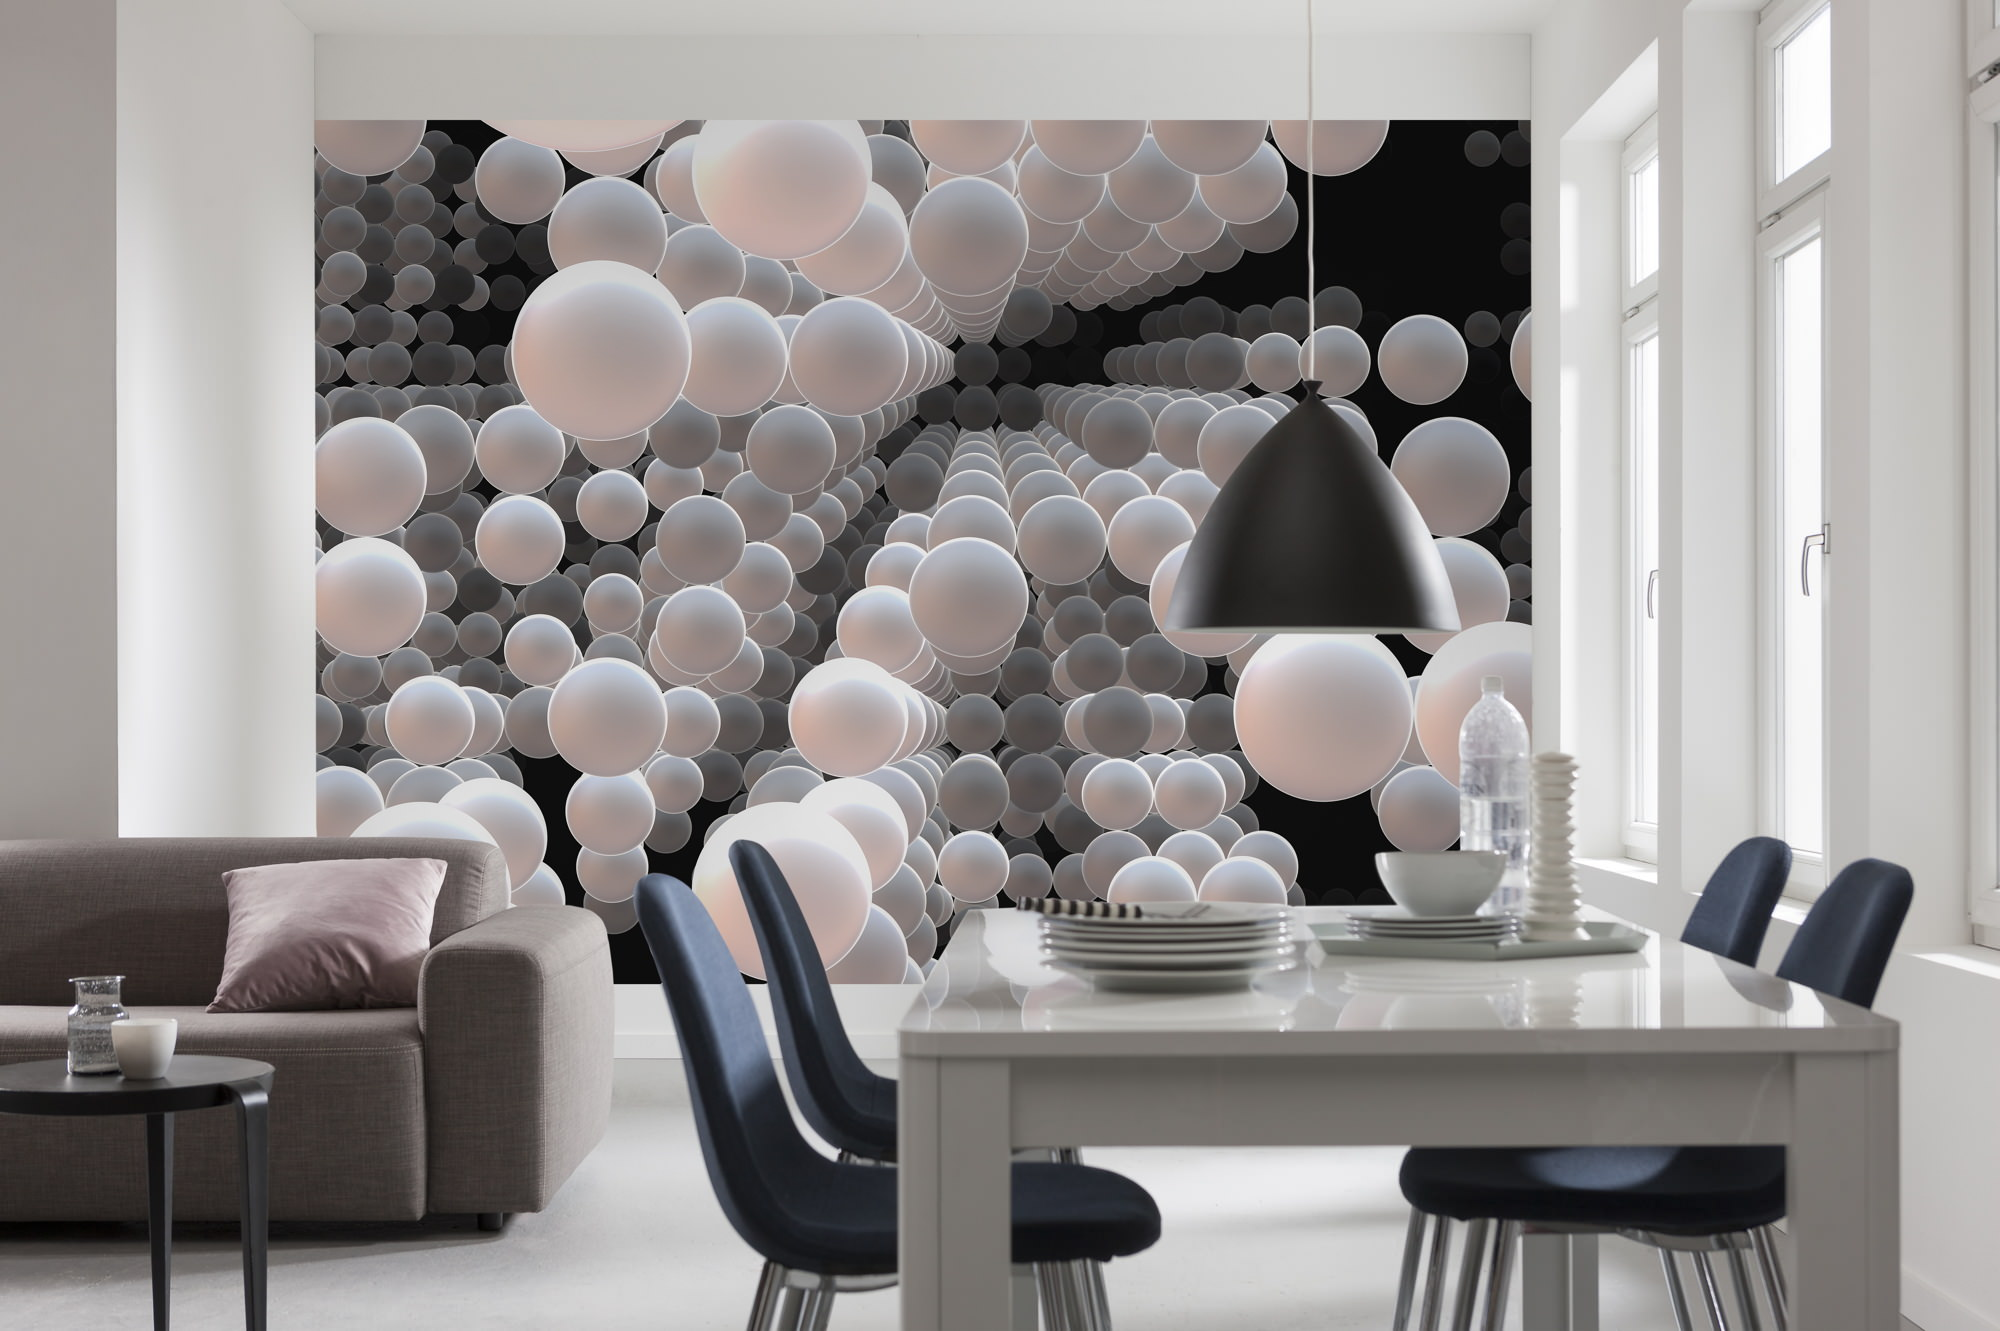 fototapete 3d spherical abstrakte kreise circle sunnywall online shop. Black Bedroom Furniture Sets. Home Design Ideas